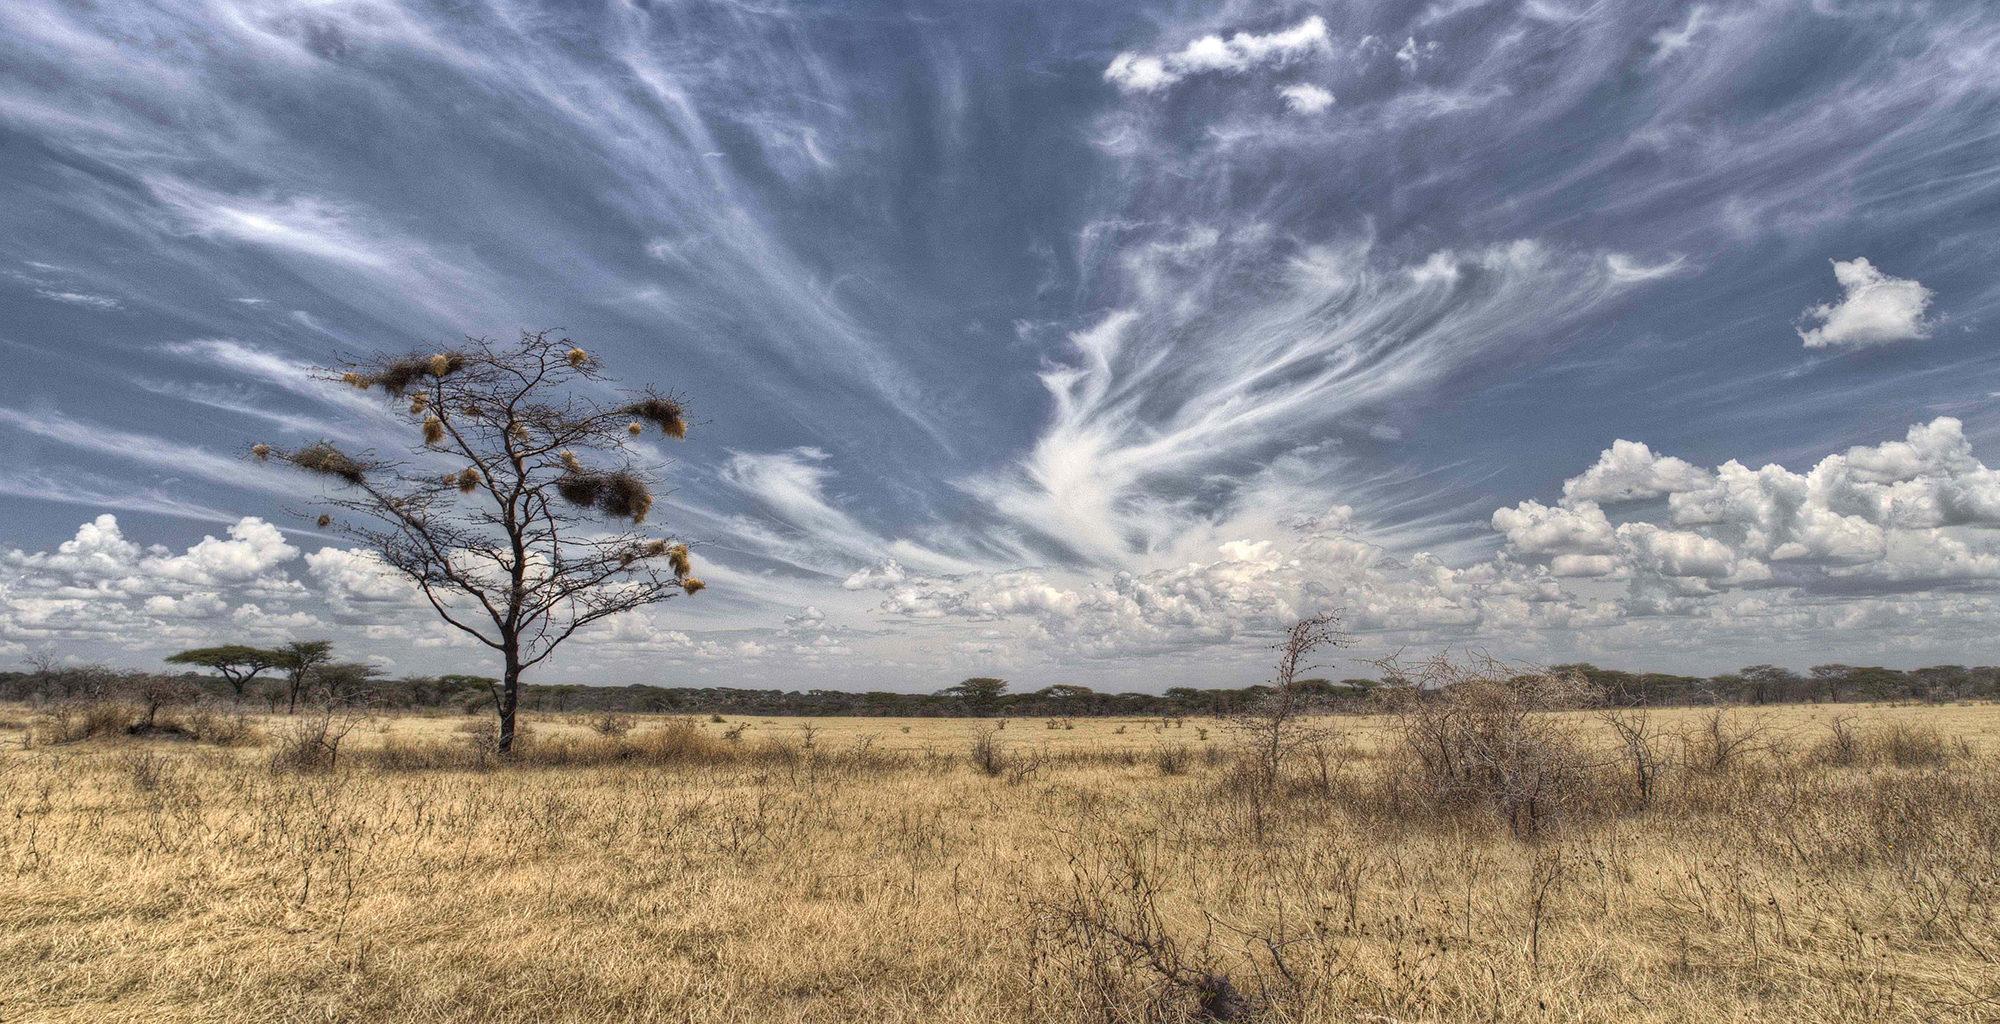 Tanzania-Serengeti-National-Park-Landscape